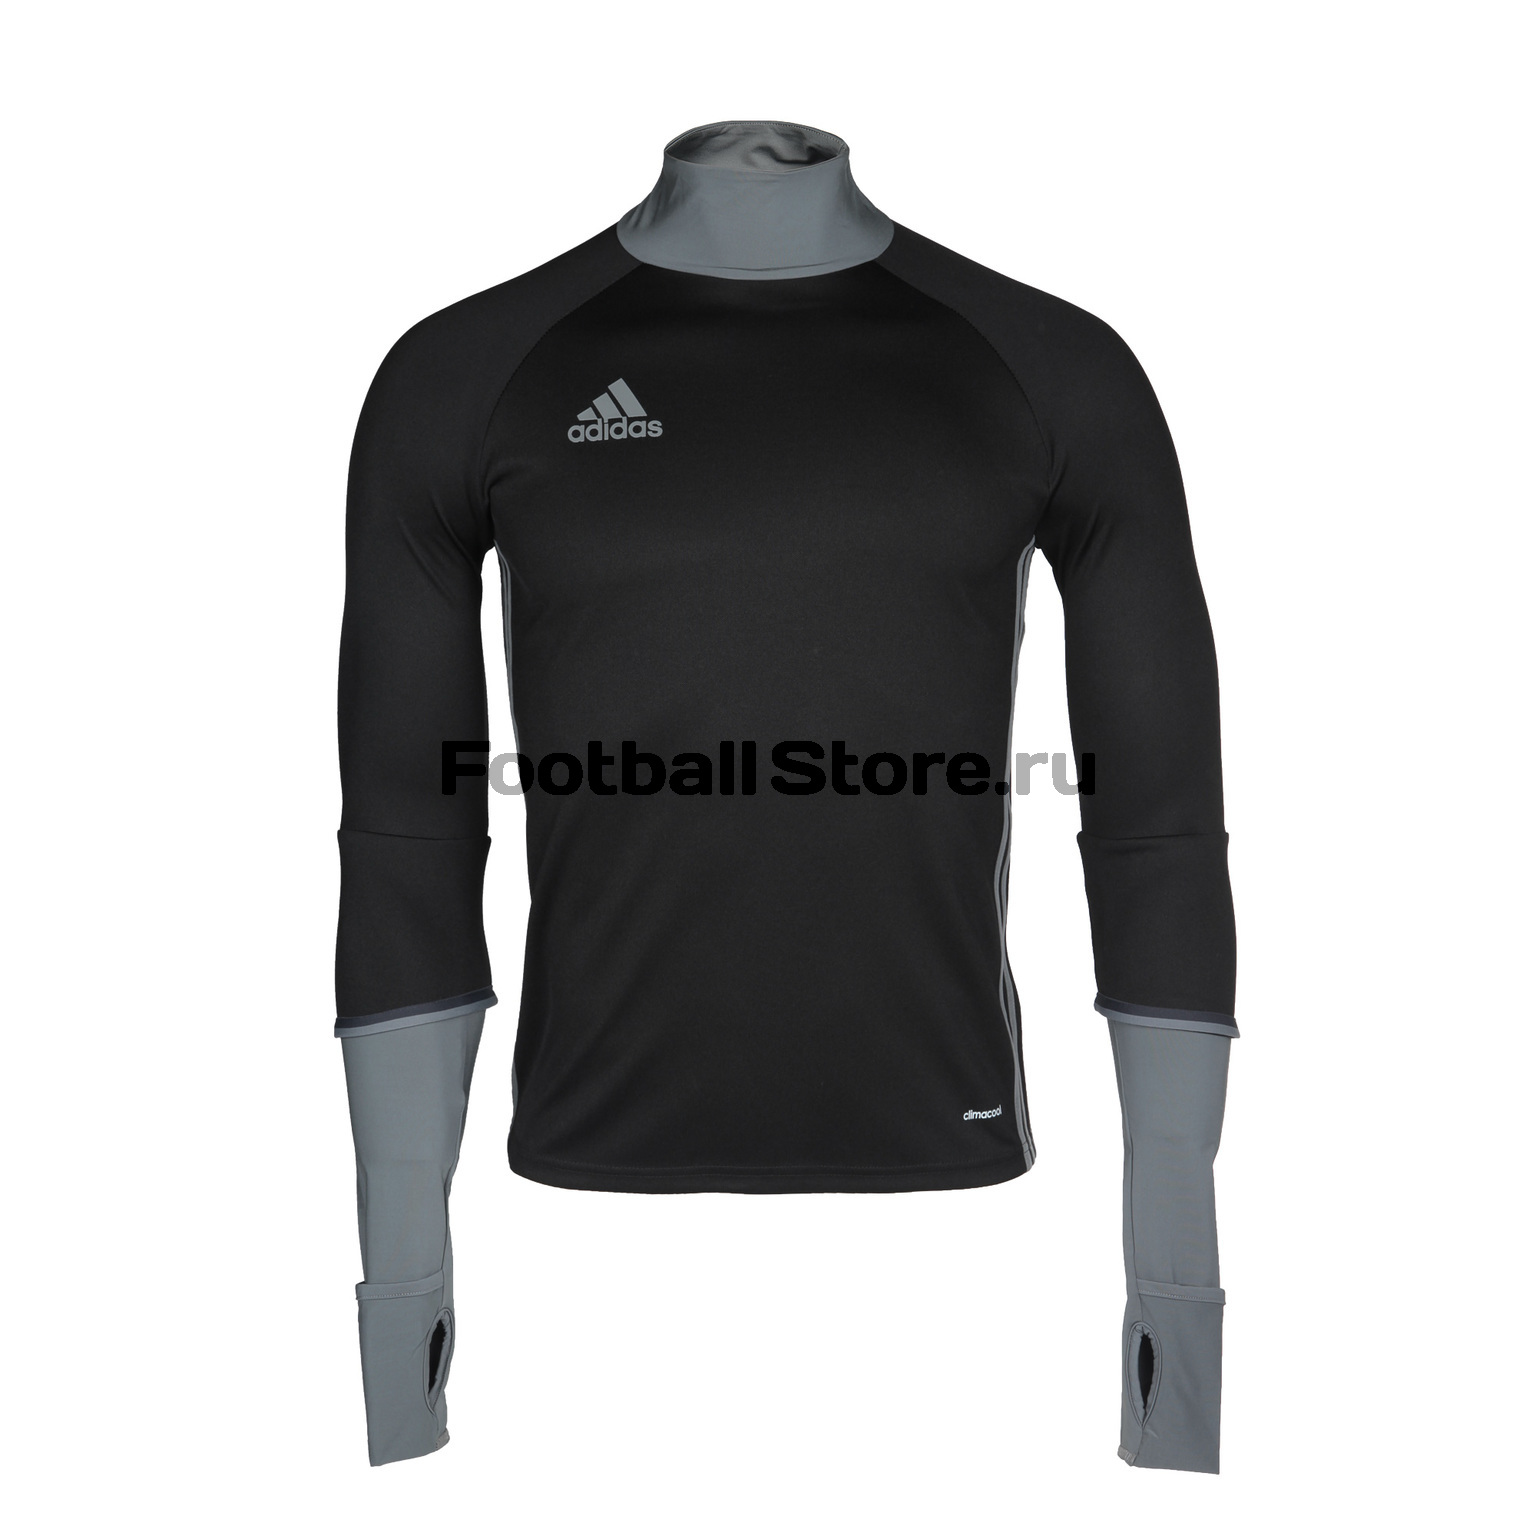 Свитер Adidas Con16 TRG TOP S93543 куртка утепленная adidas con16 pad jkt ab3145